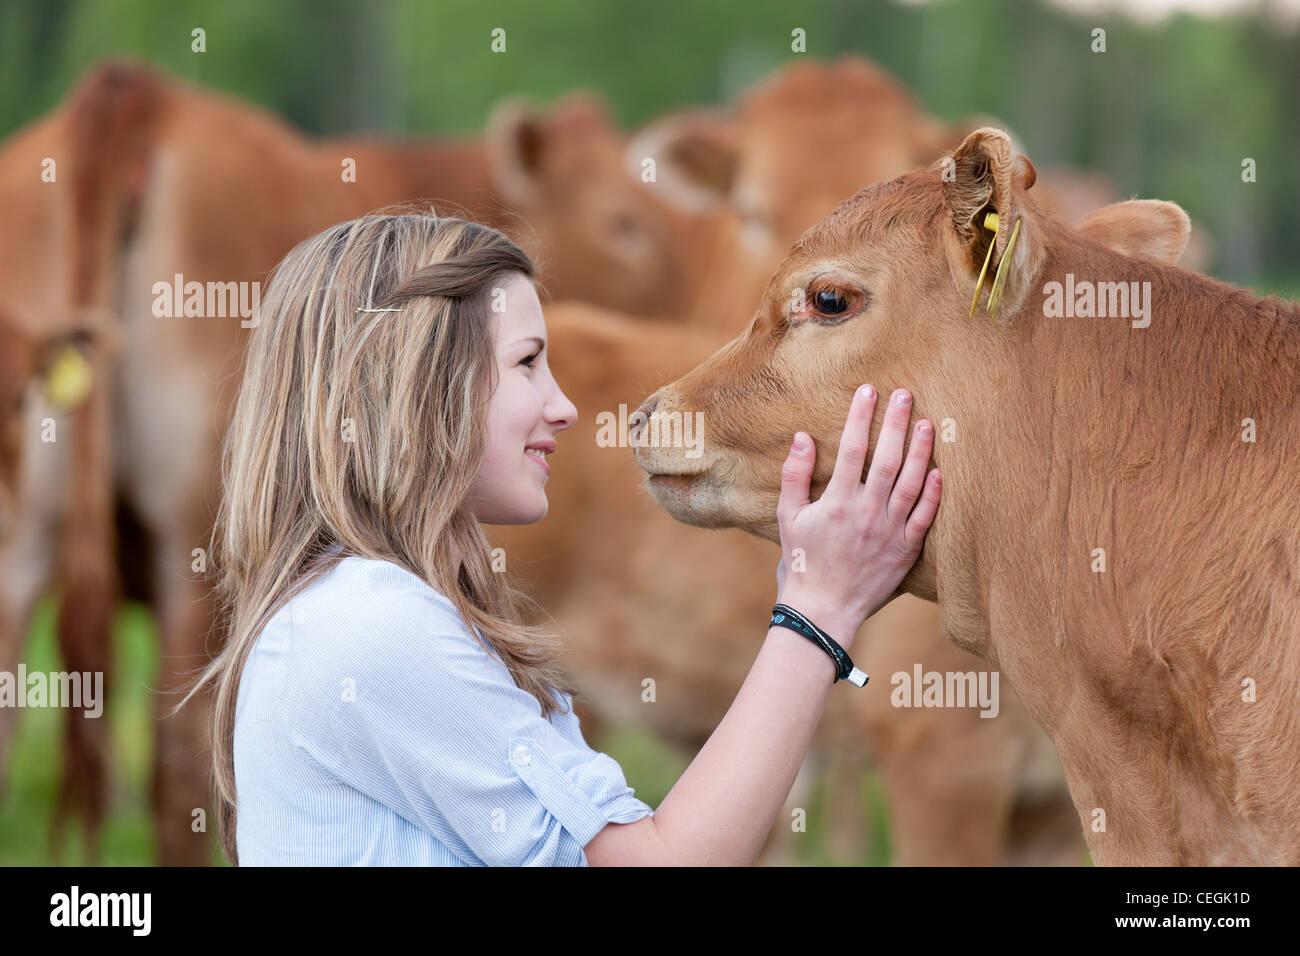 Girl stroking calf - Stock Image